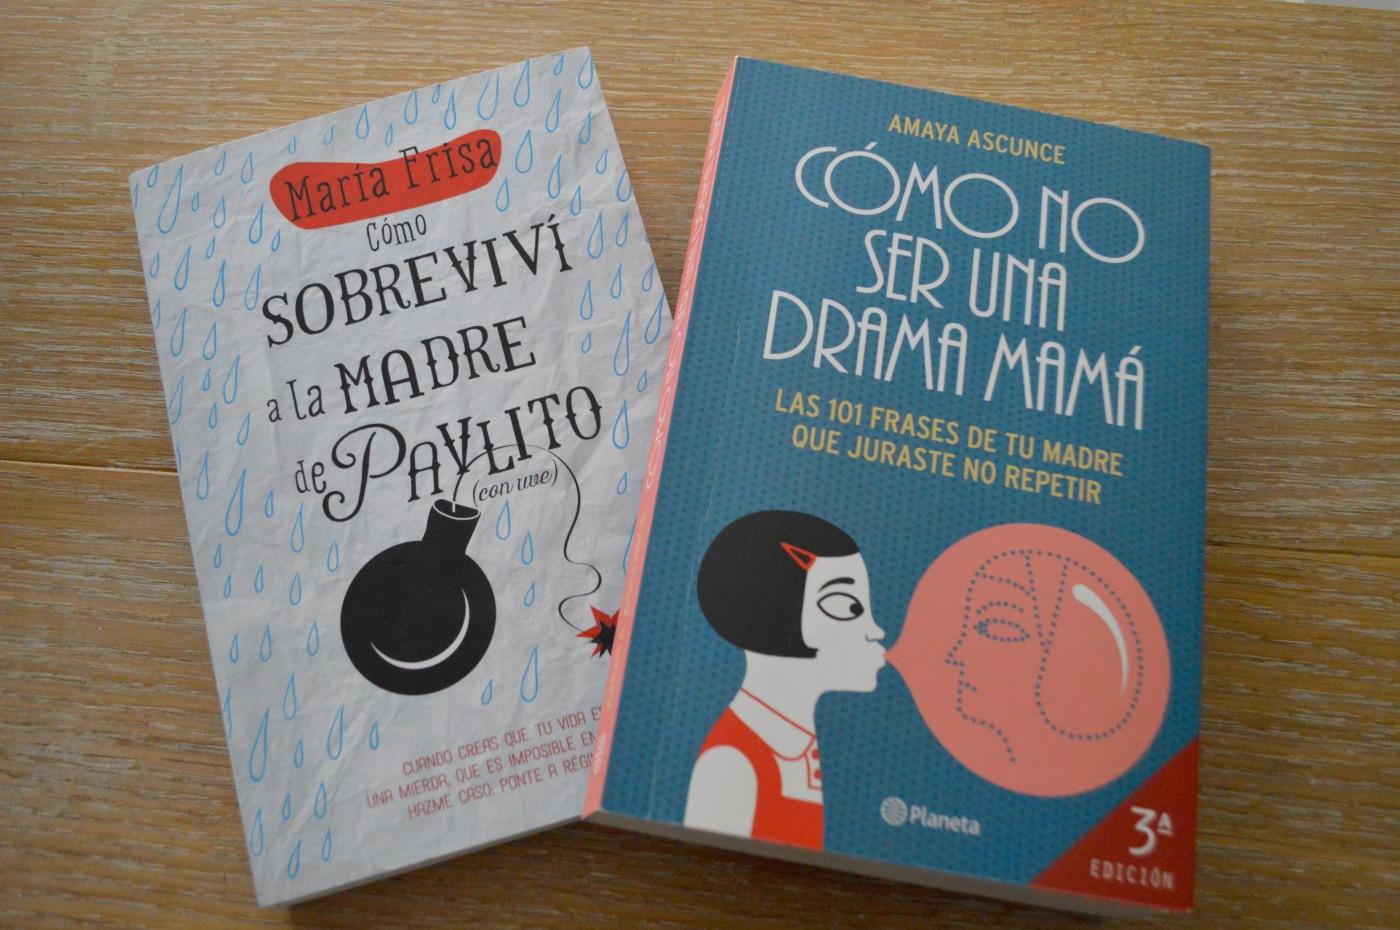 winter-of-67-libros-sobre-madres-maternidad.JPG